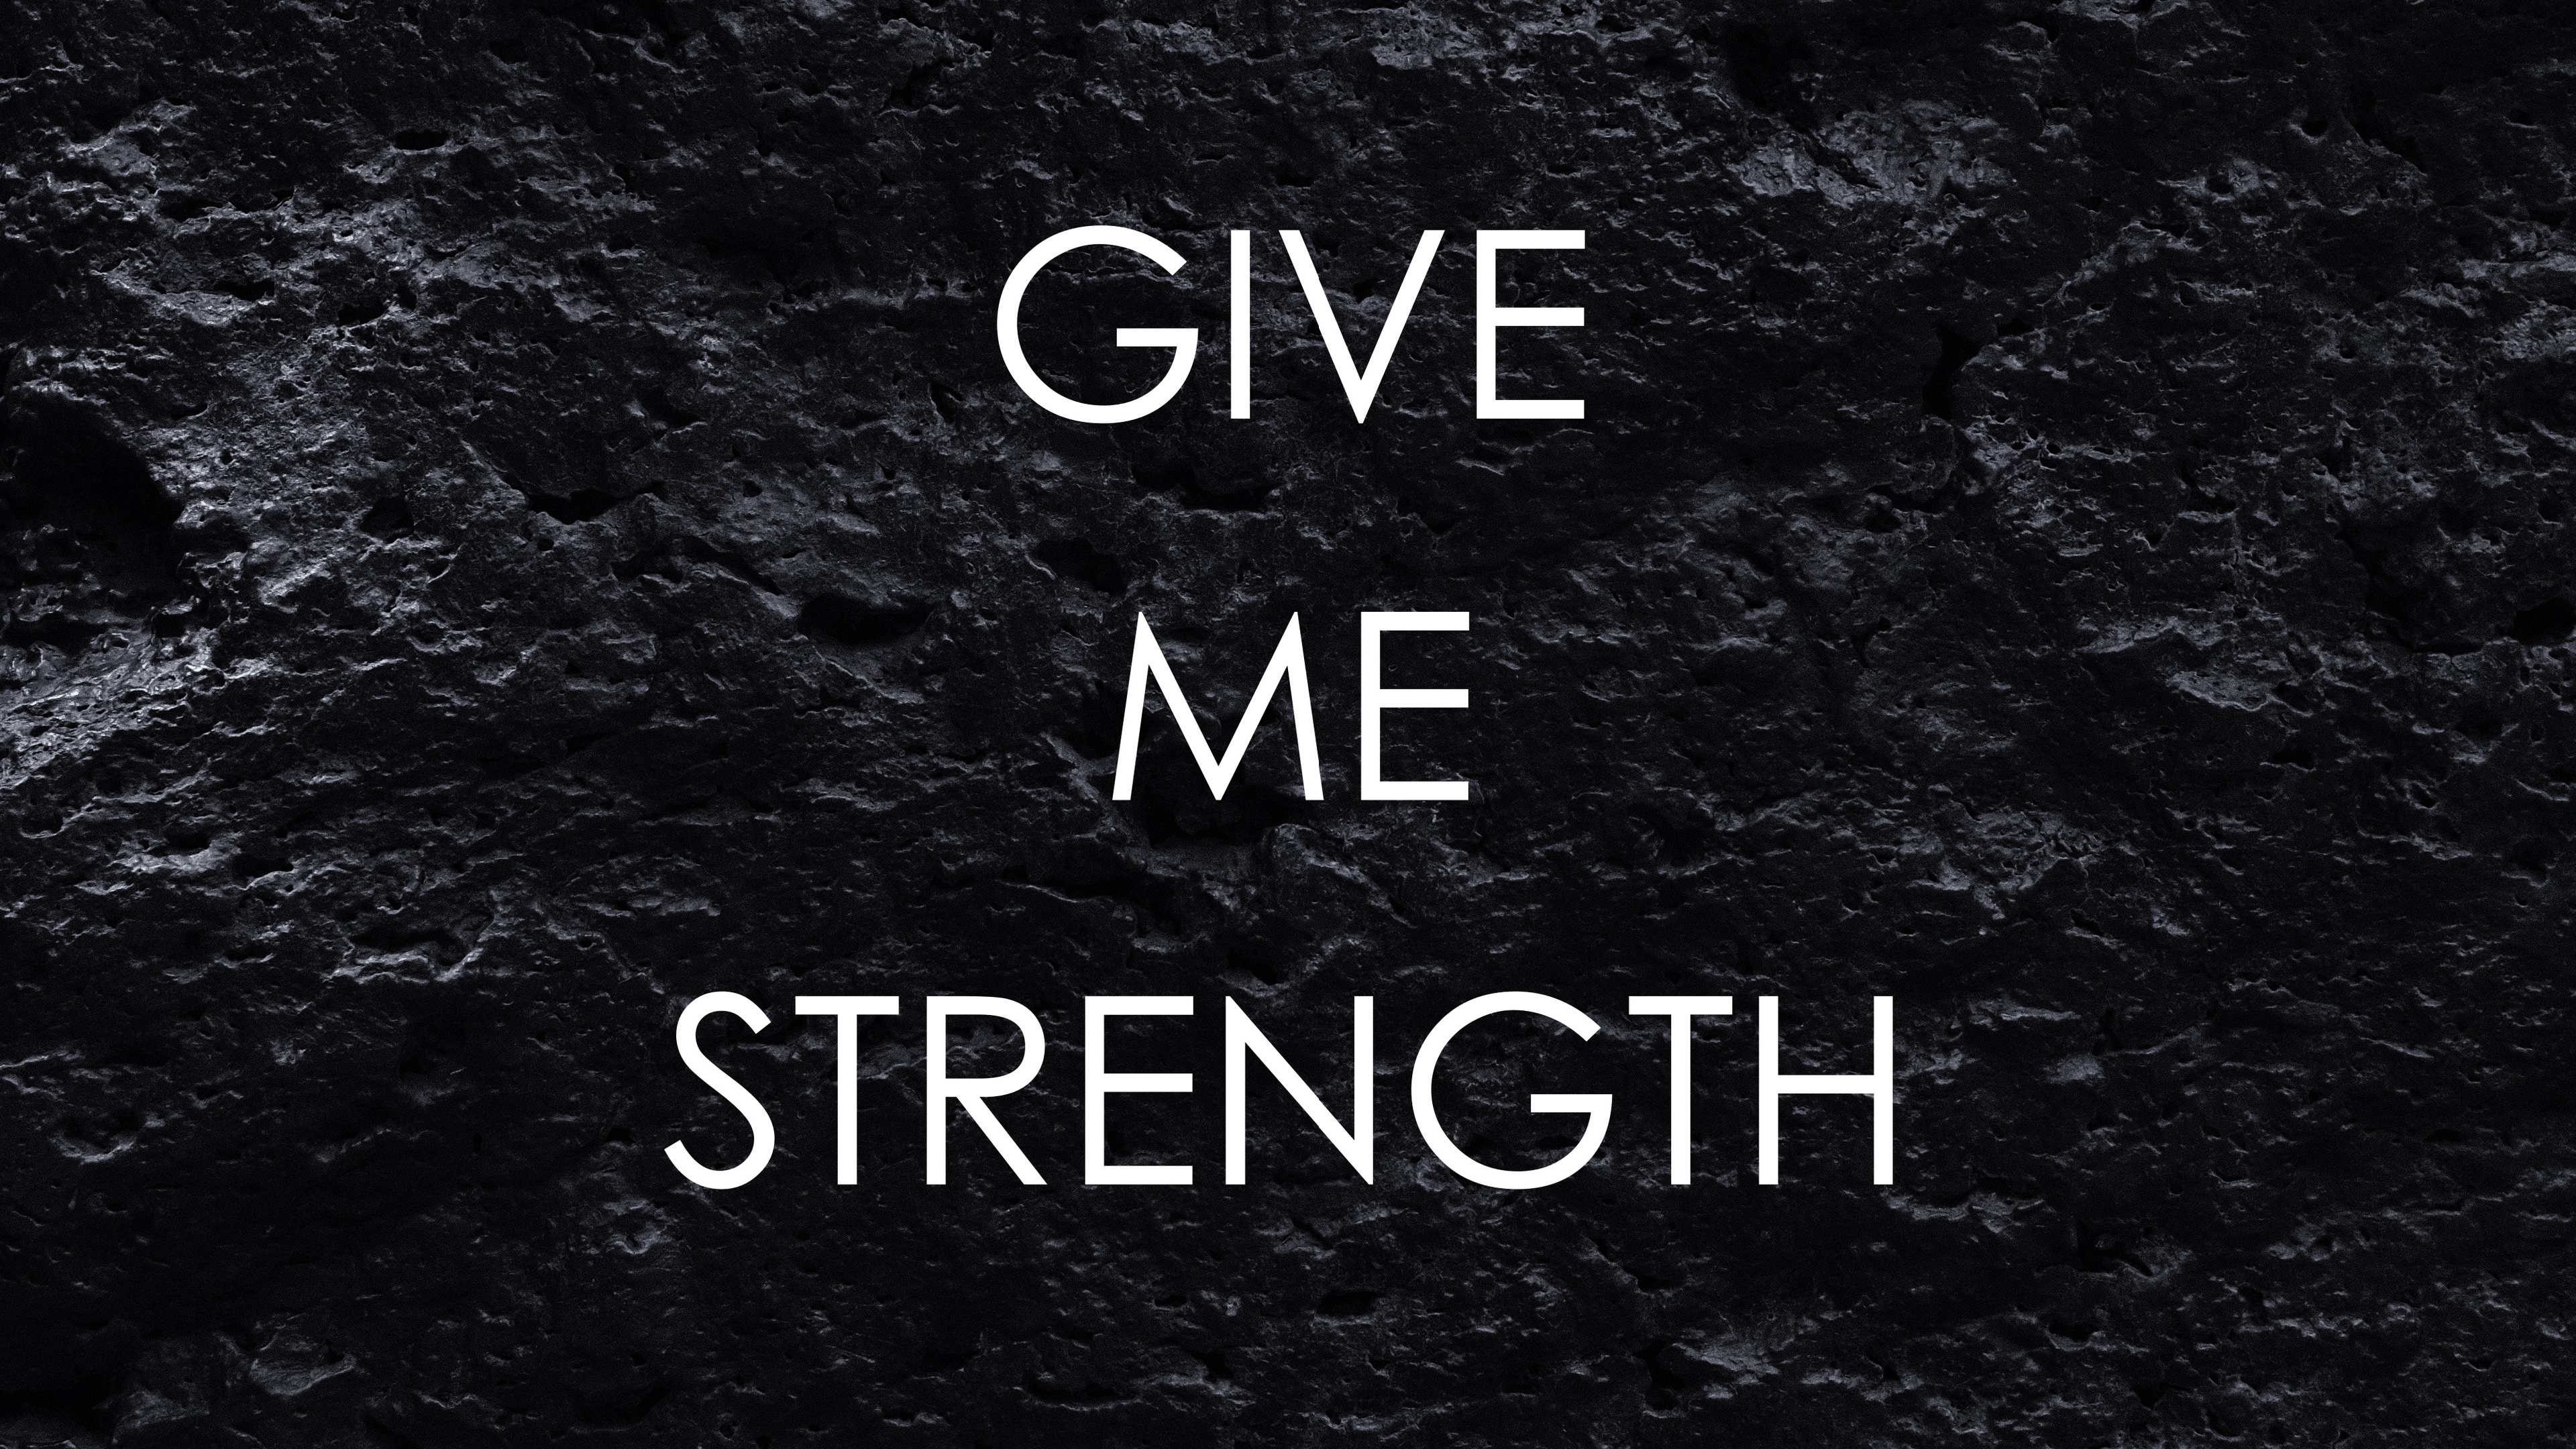 Download wallpaper 3840x2160 motivation strength patience 3840x2160